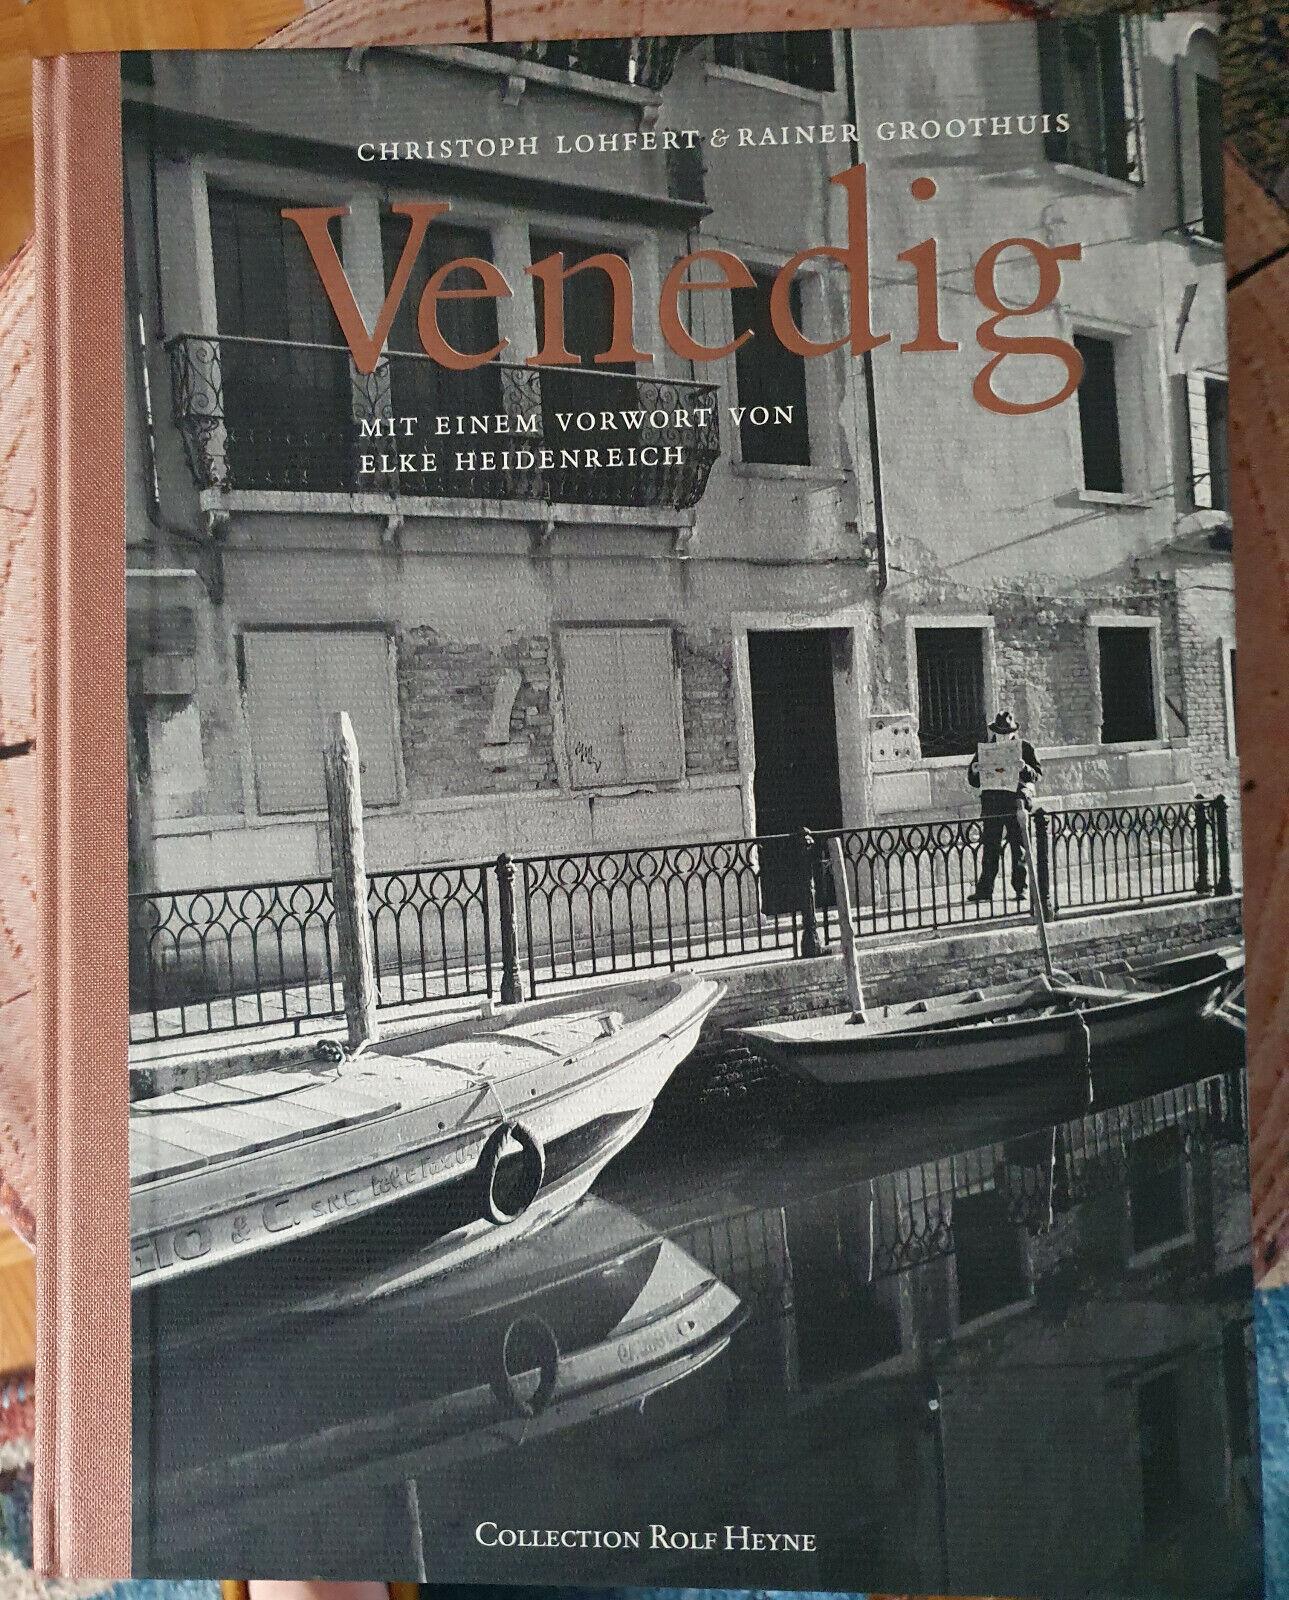 Venedig Christoph Lohfert & Rainer Groothuis Vorwort Elke Heidenreich